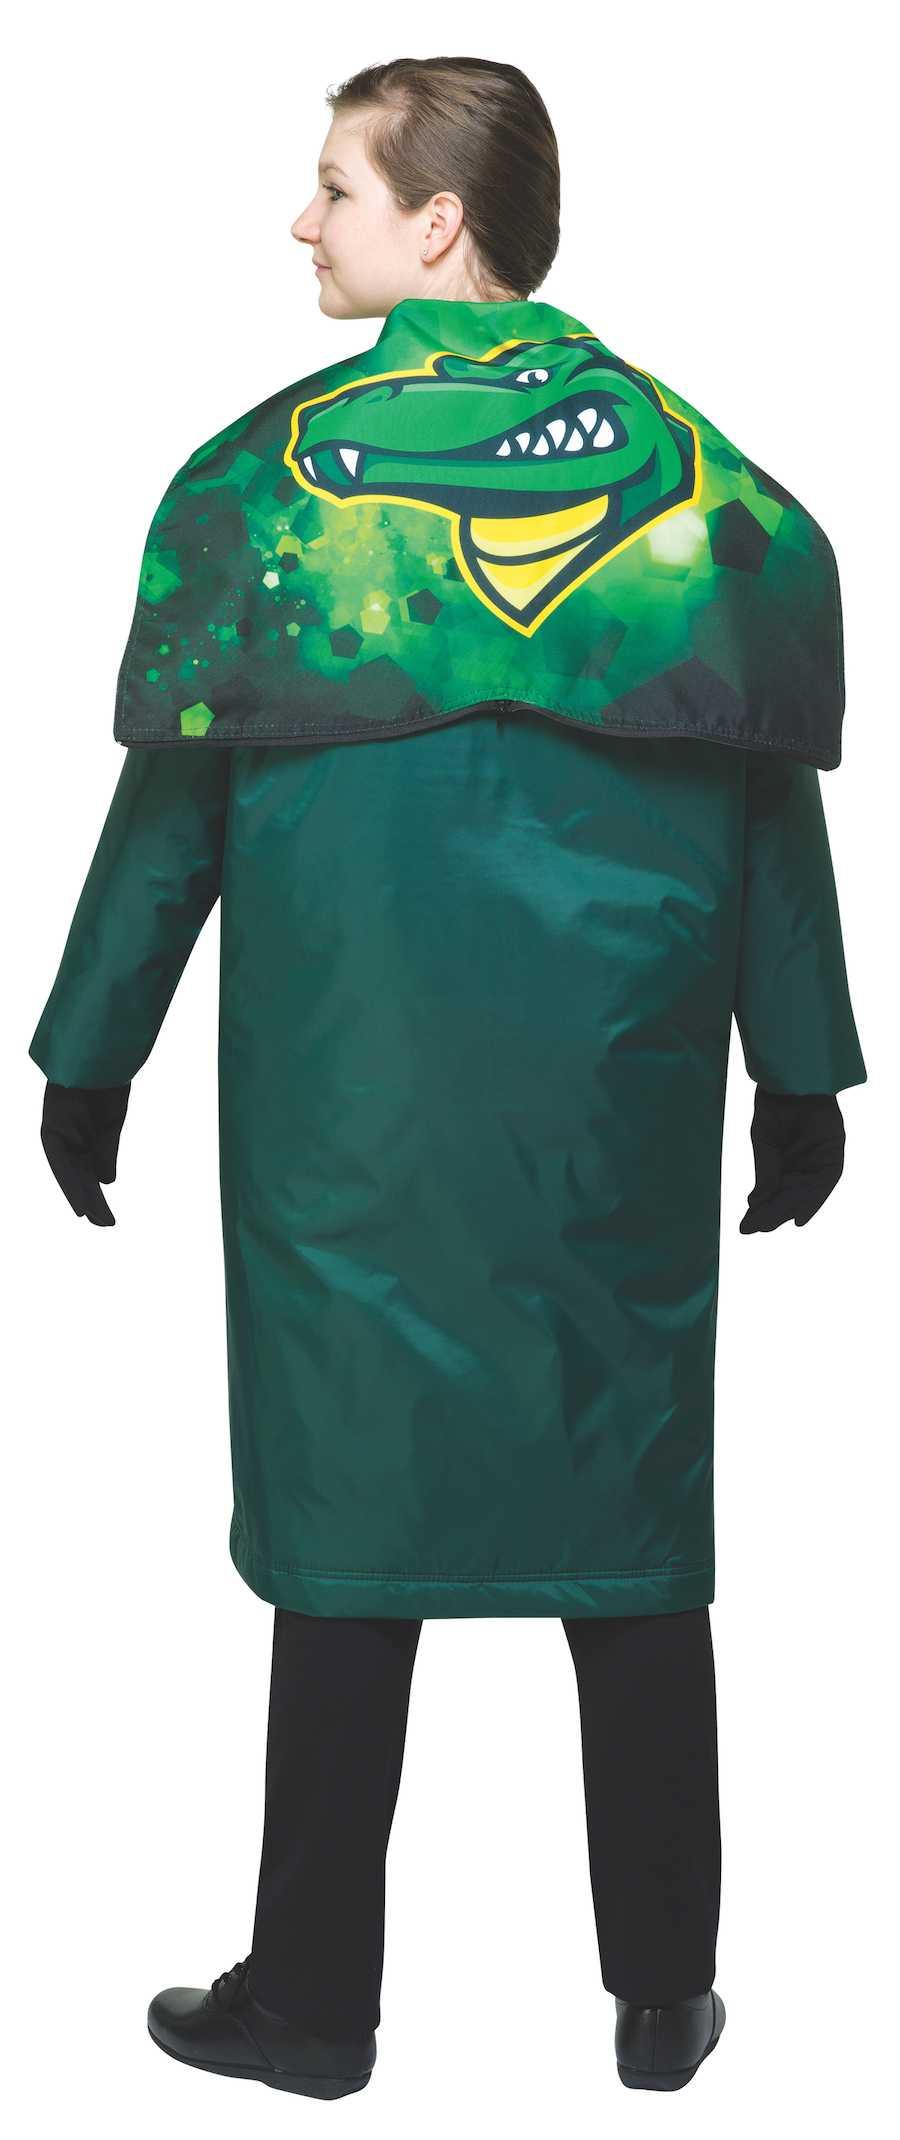 Styleplus Fashion Hood for Standard Performer Rainwear